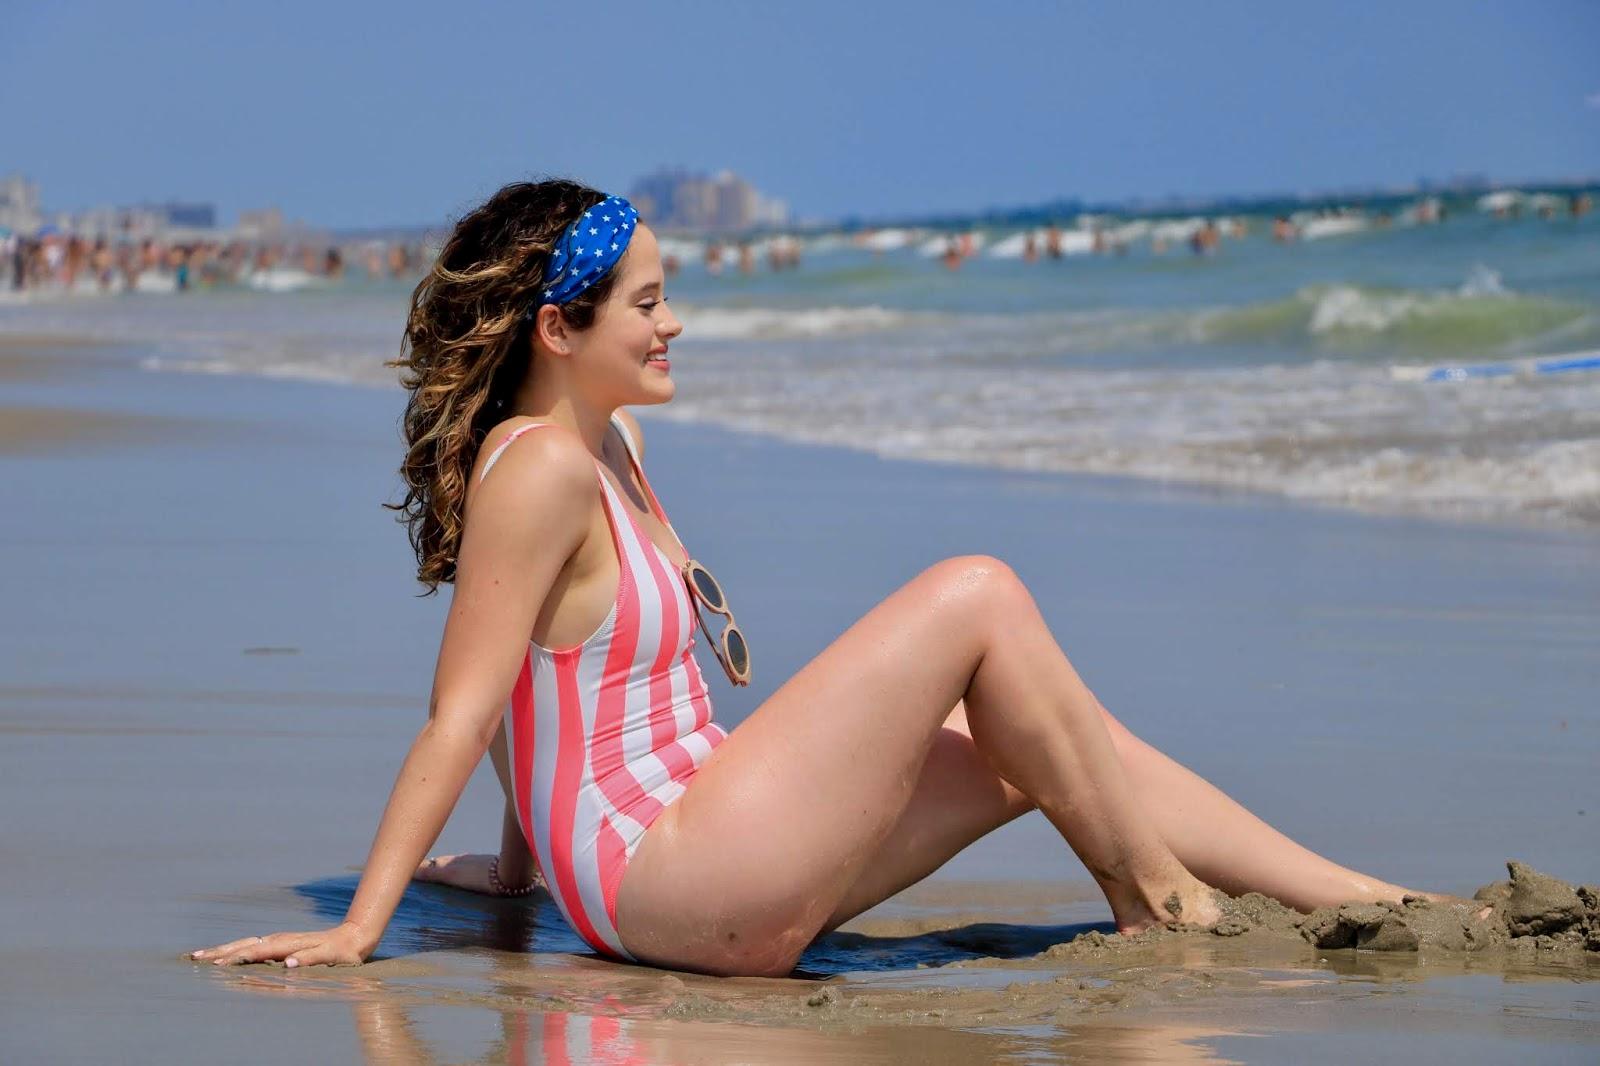 Nyc fashion blogger Kathleen Harper on Rockaway Beach, New York.